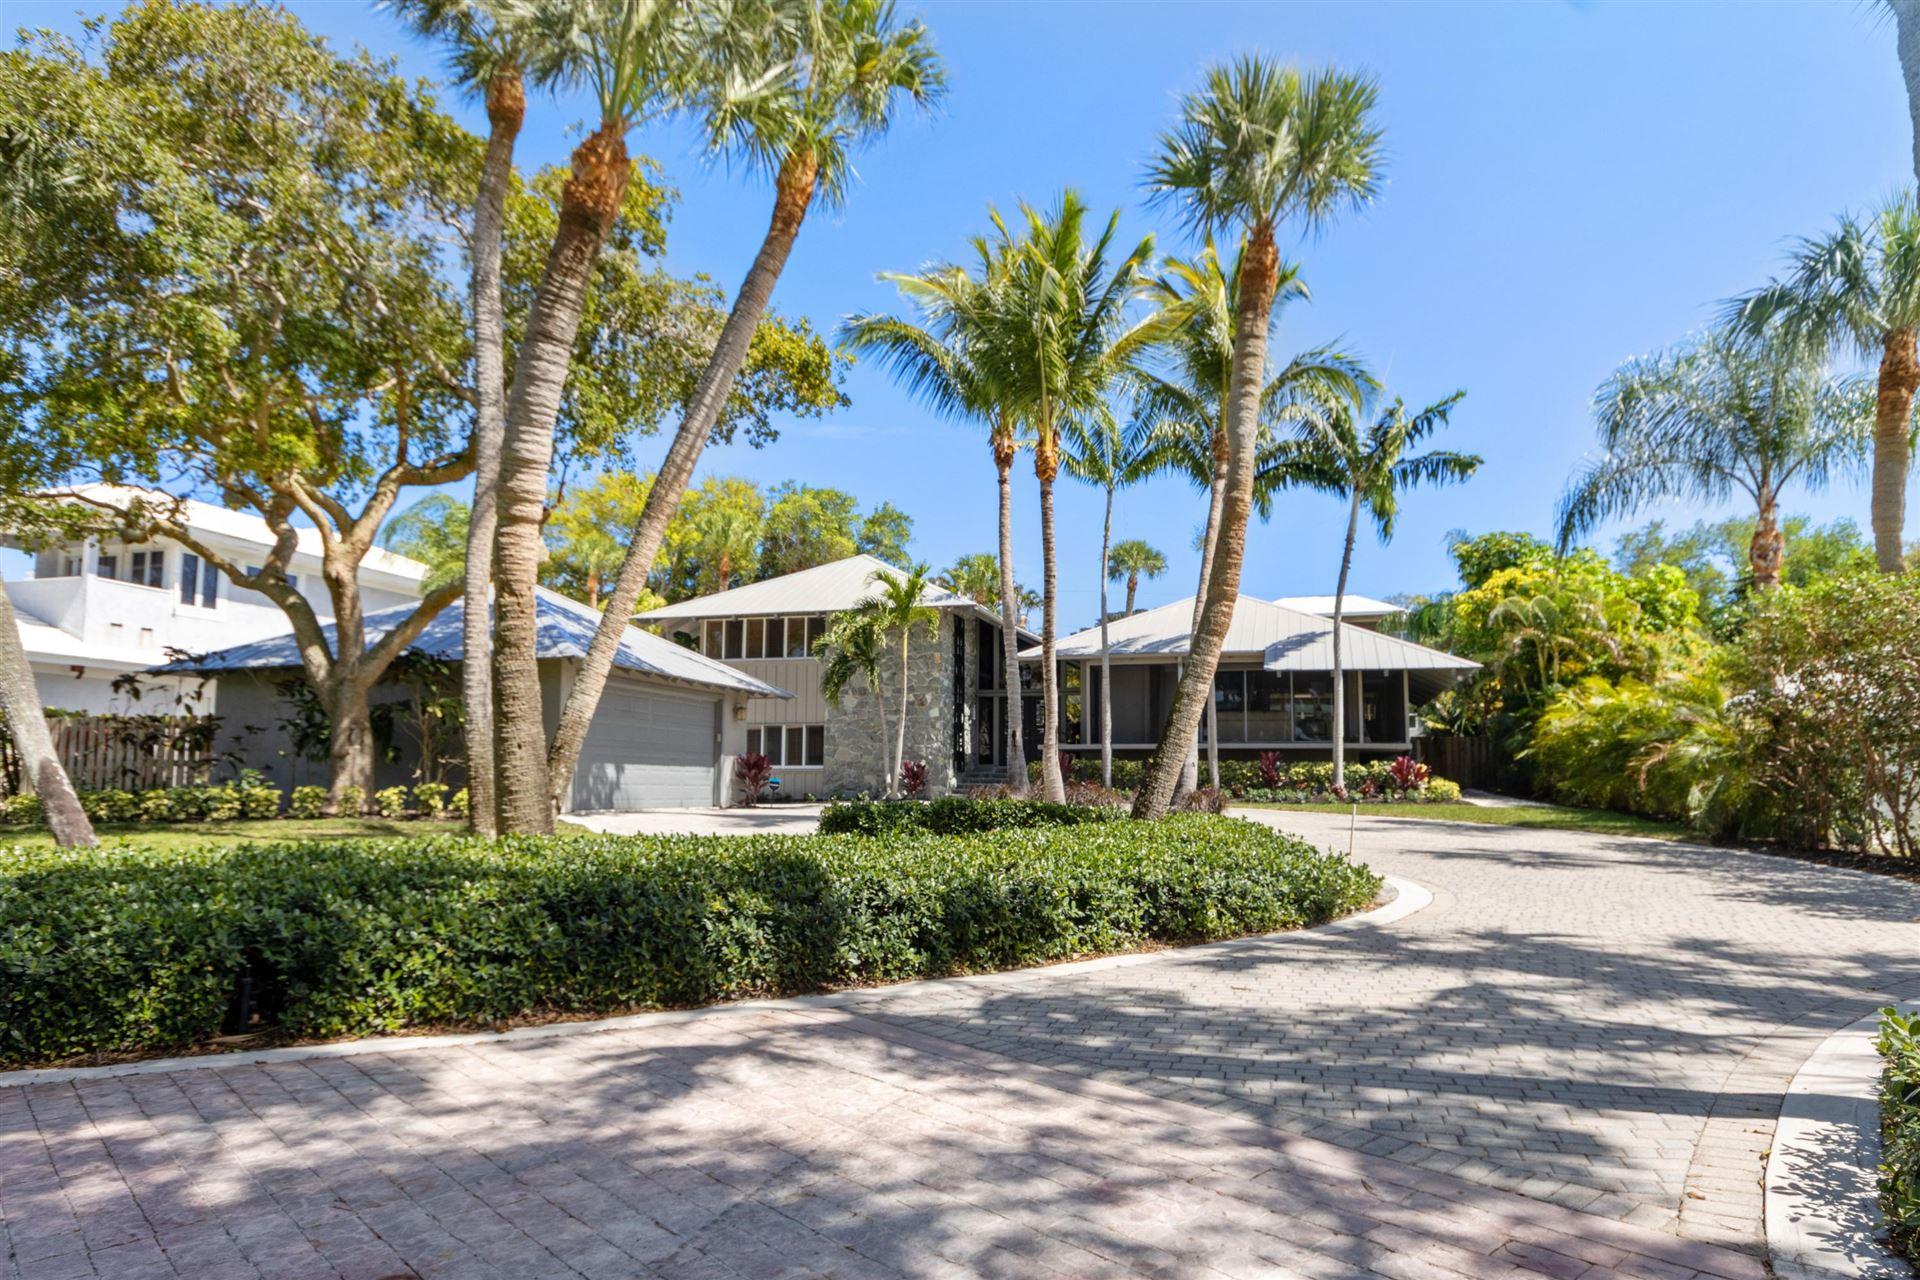 32 W High Point Road, Sewalls Point, FL 34996 - #: RX-10608436